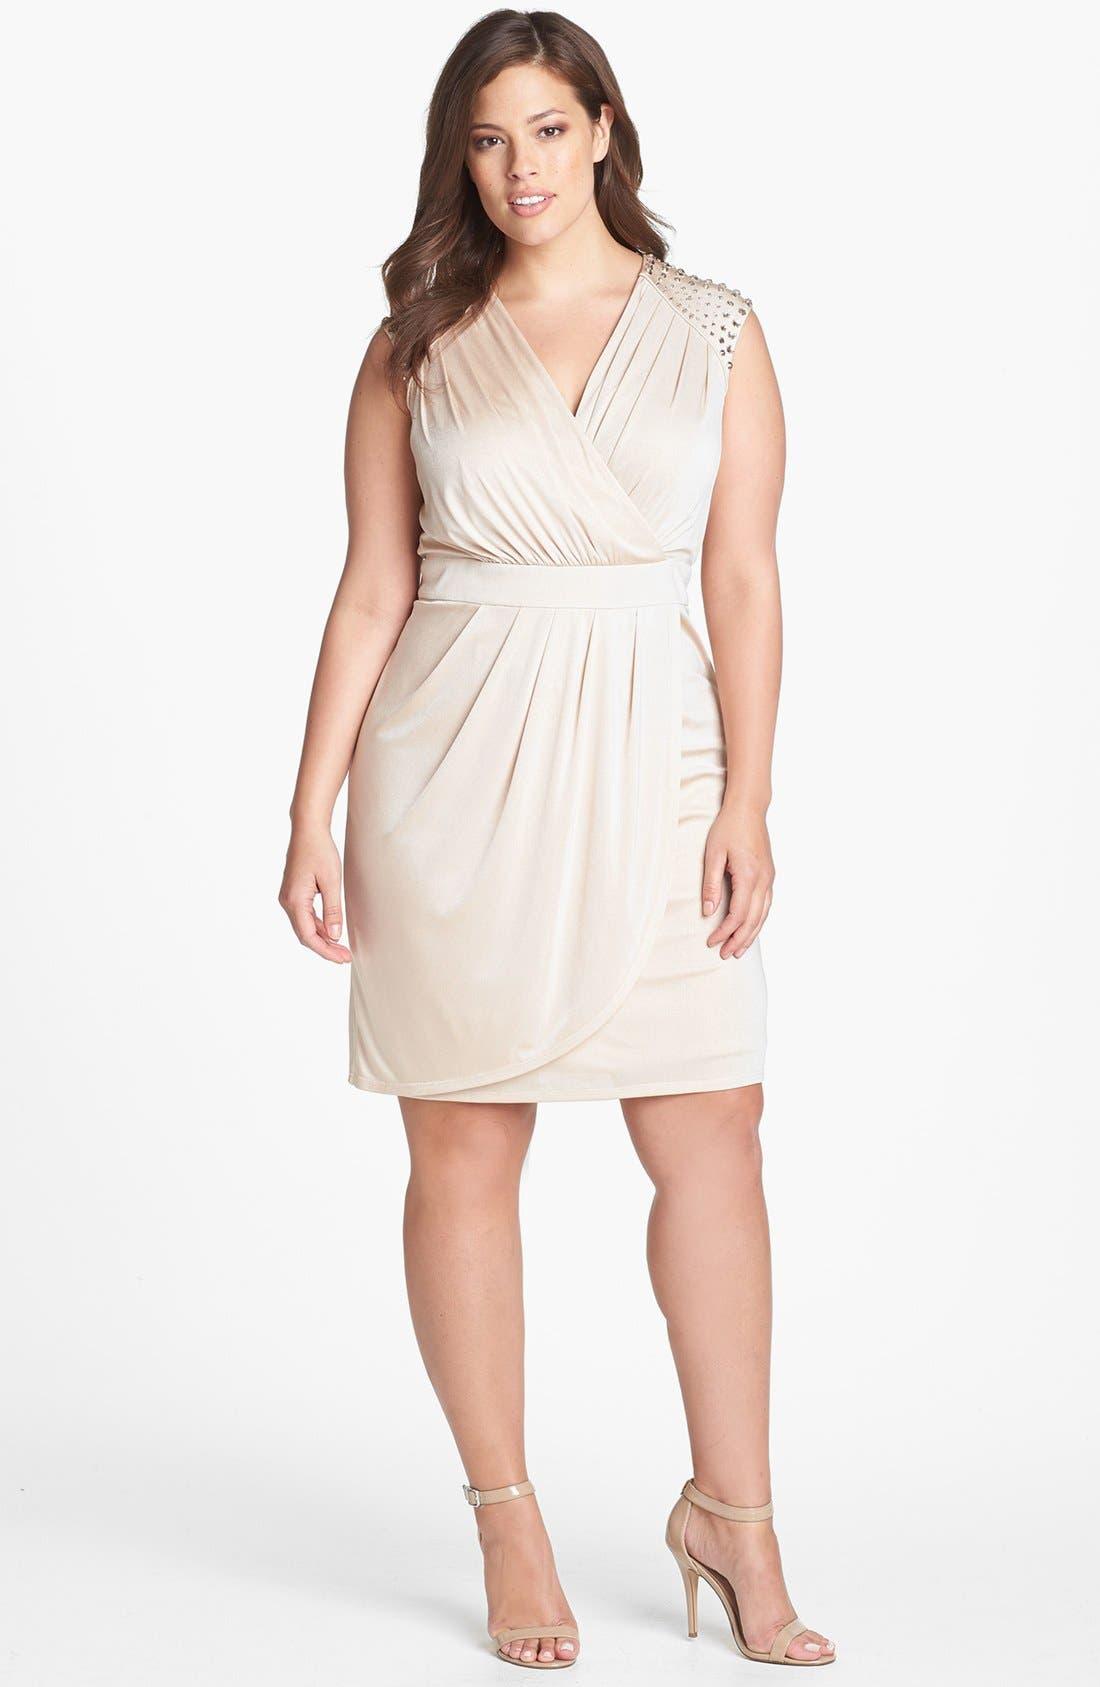 Alternate Image 1 Selected - Vince Camuto Embellished Faux Wrap Dress (Plus Size)